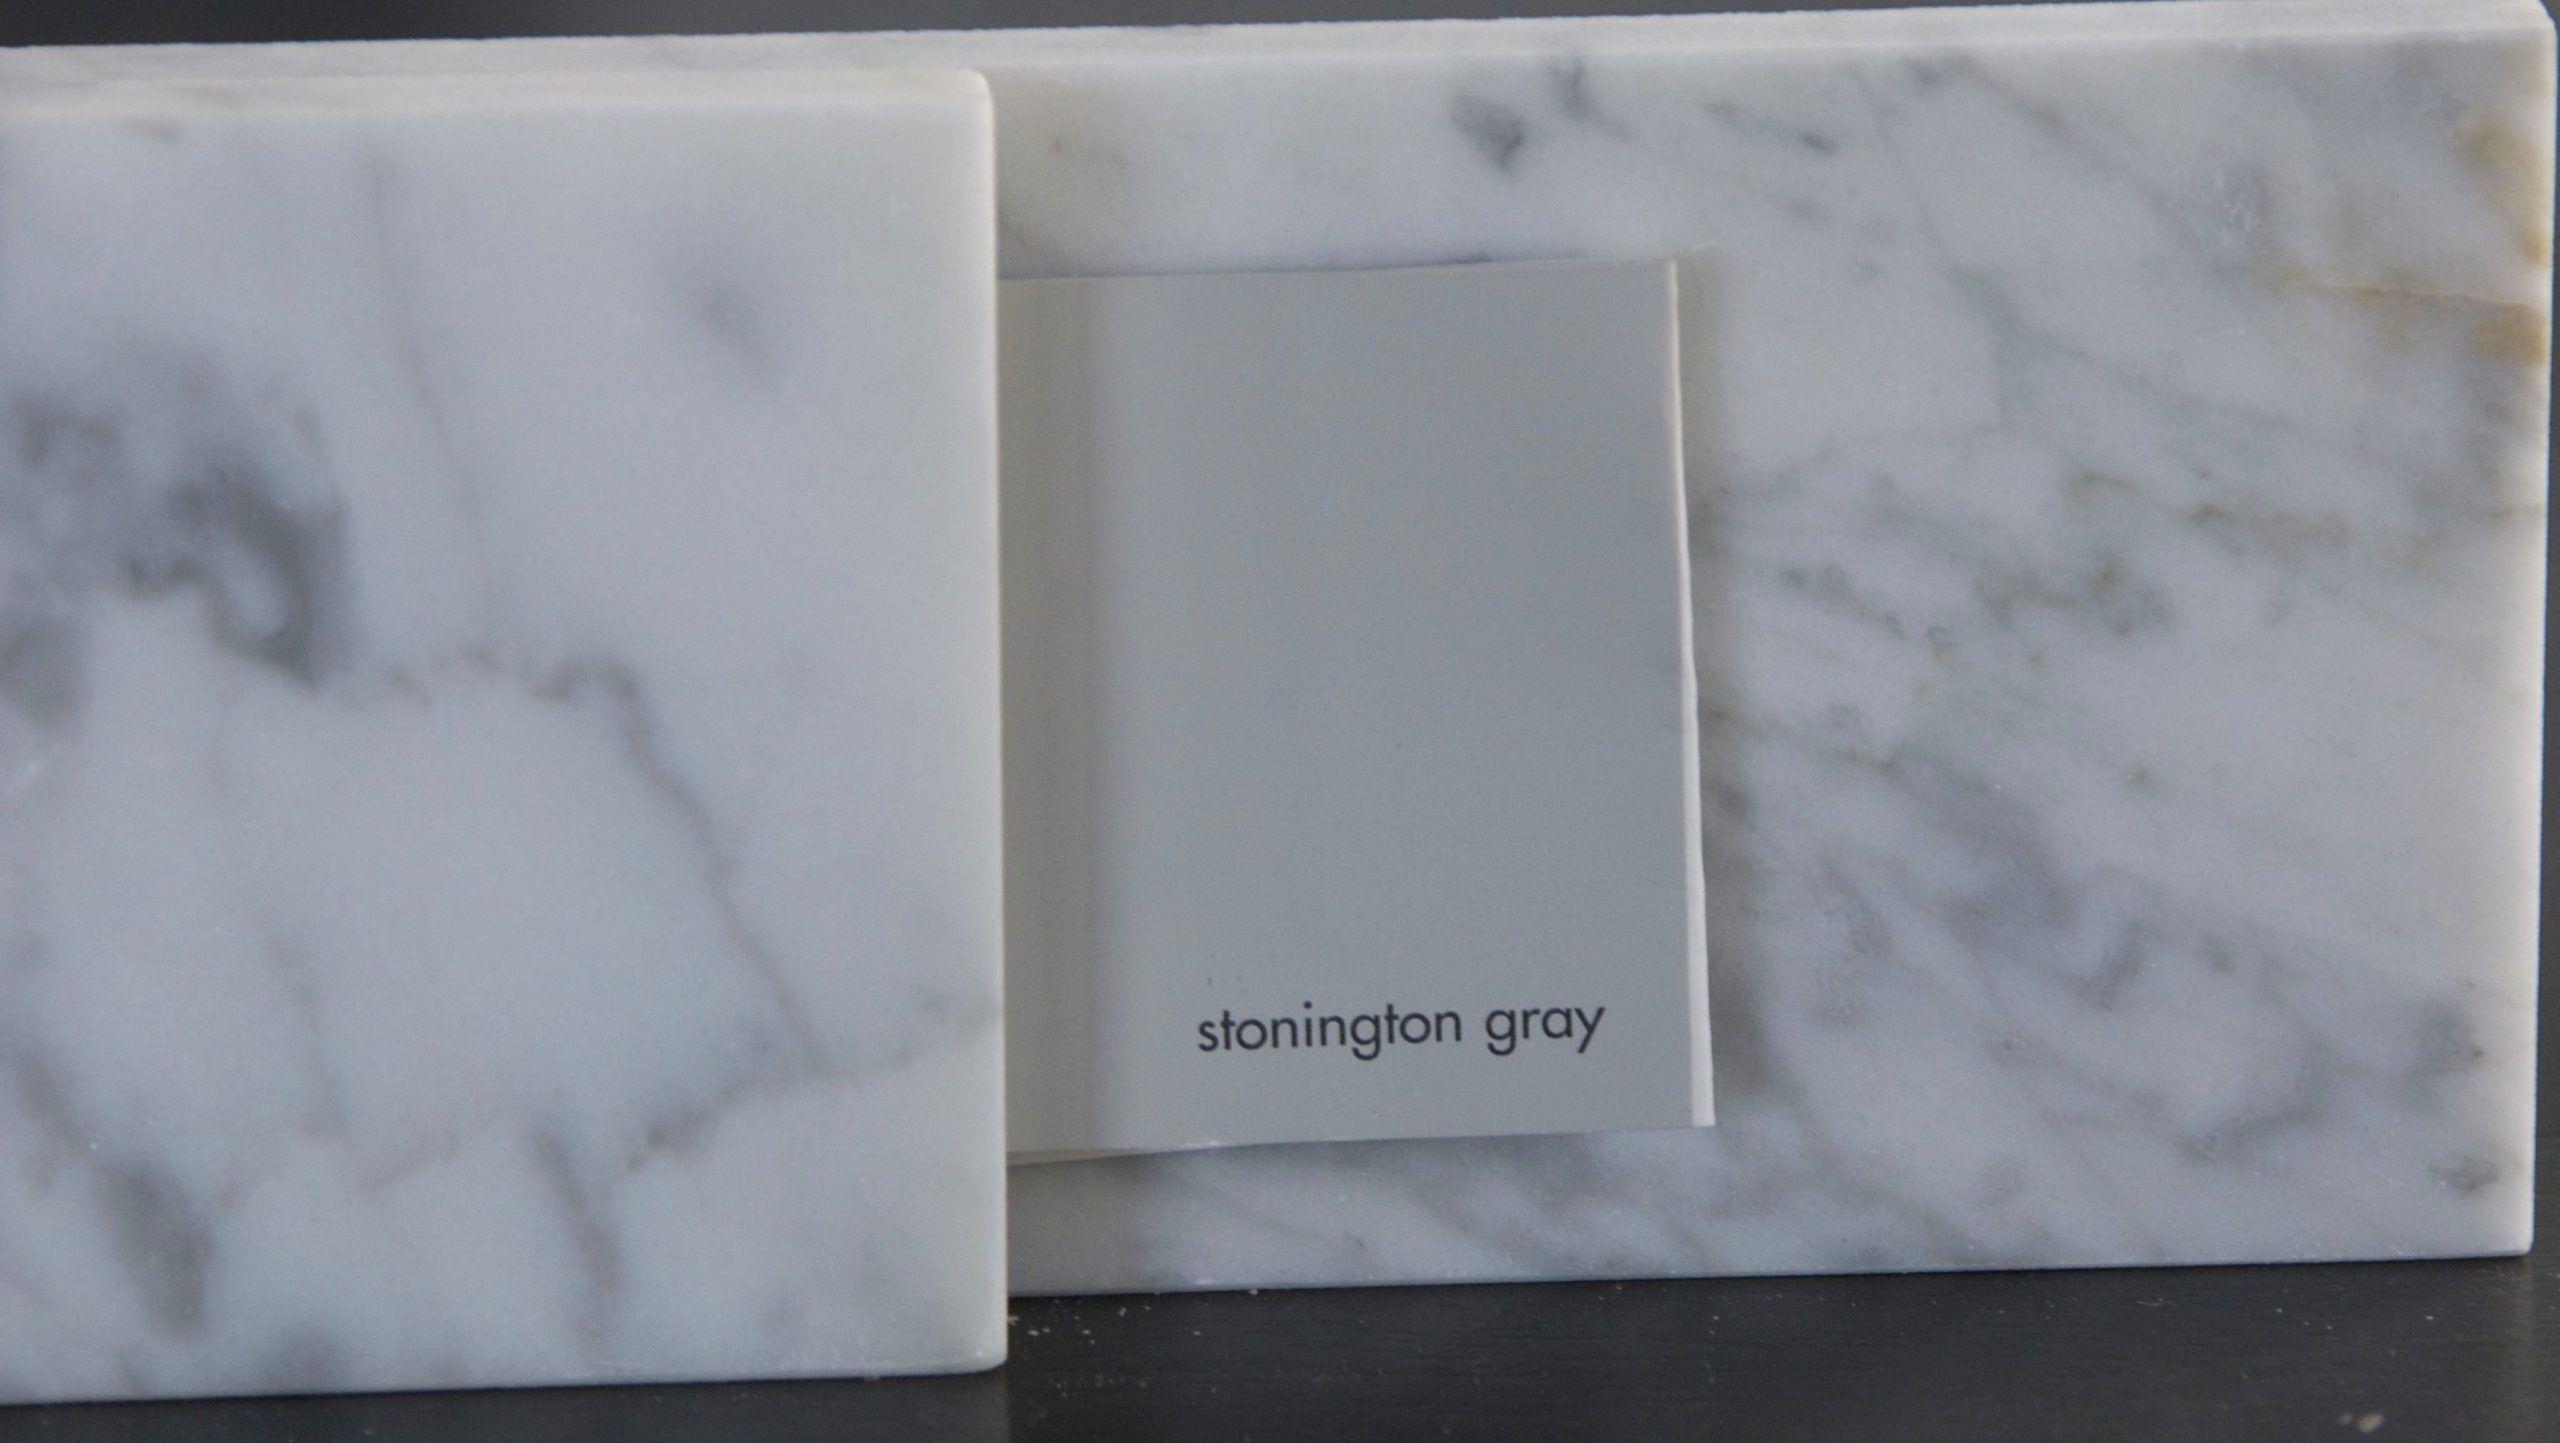 Best Paint Color Carrara Marble Bathroom Best Paint Color Carrara Marble Bathroom Best Paint Color Carrara Marble Bathroom Norway S Best Auberge Isn T In Oslo Di 2020